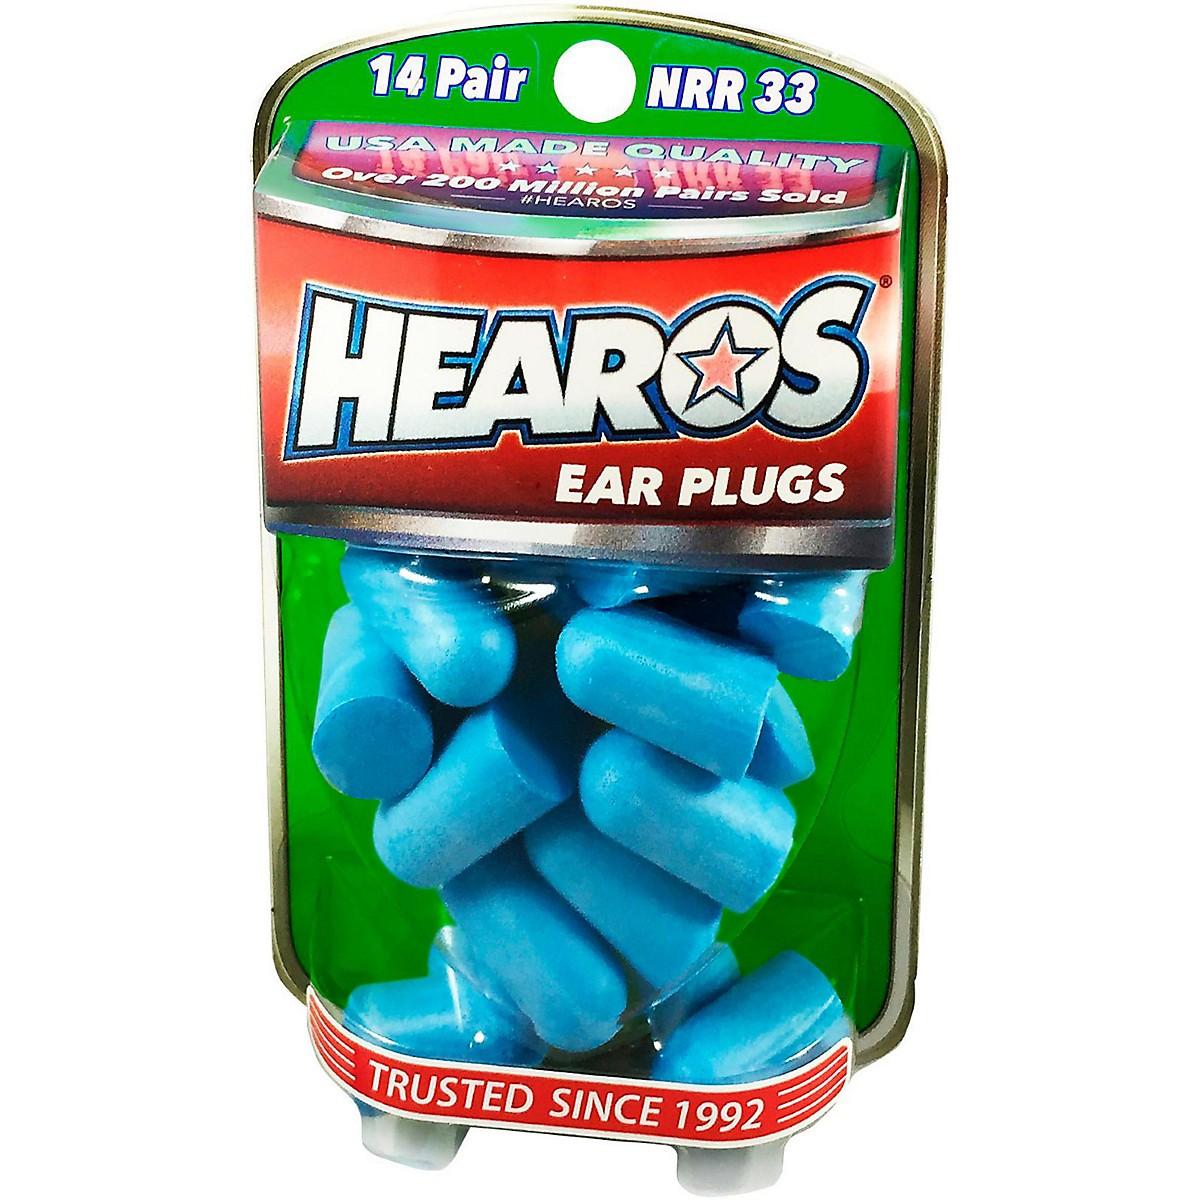 Hearos Xtreme Protection Series Ear Plugs 14-Pair